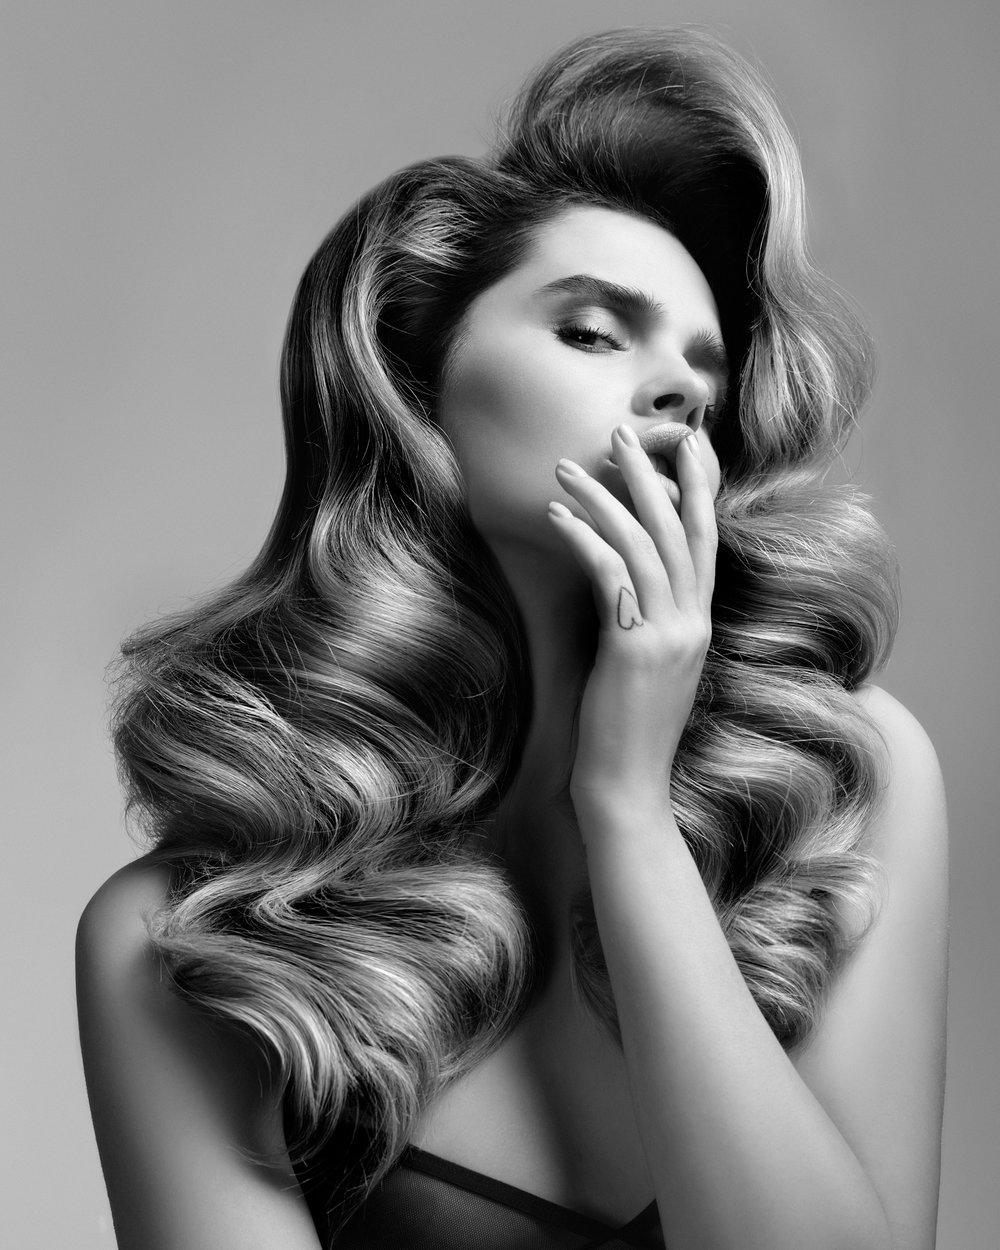 Jack_Eames_Kim_Roy_Hair_Beauty_Photography_London_02.jpg